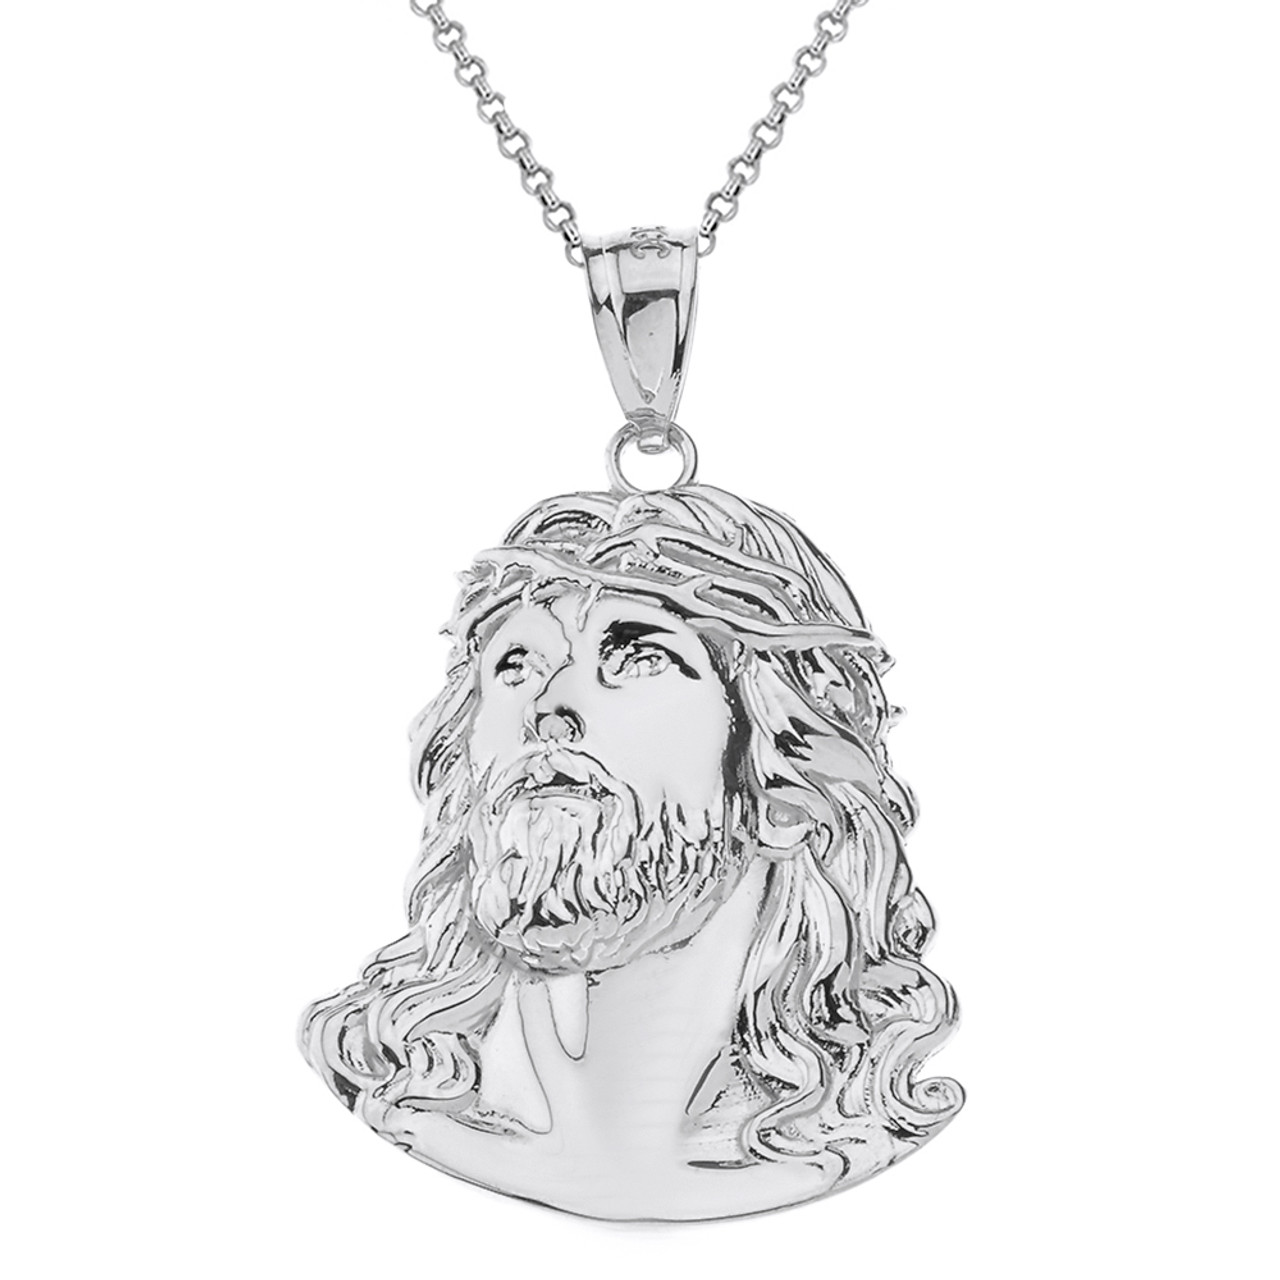 Solid White Gold Jesus Christ Head Pendant Necklace  95238.1536960151.jpg c 2 imbypass on 8a7e764e772d